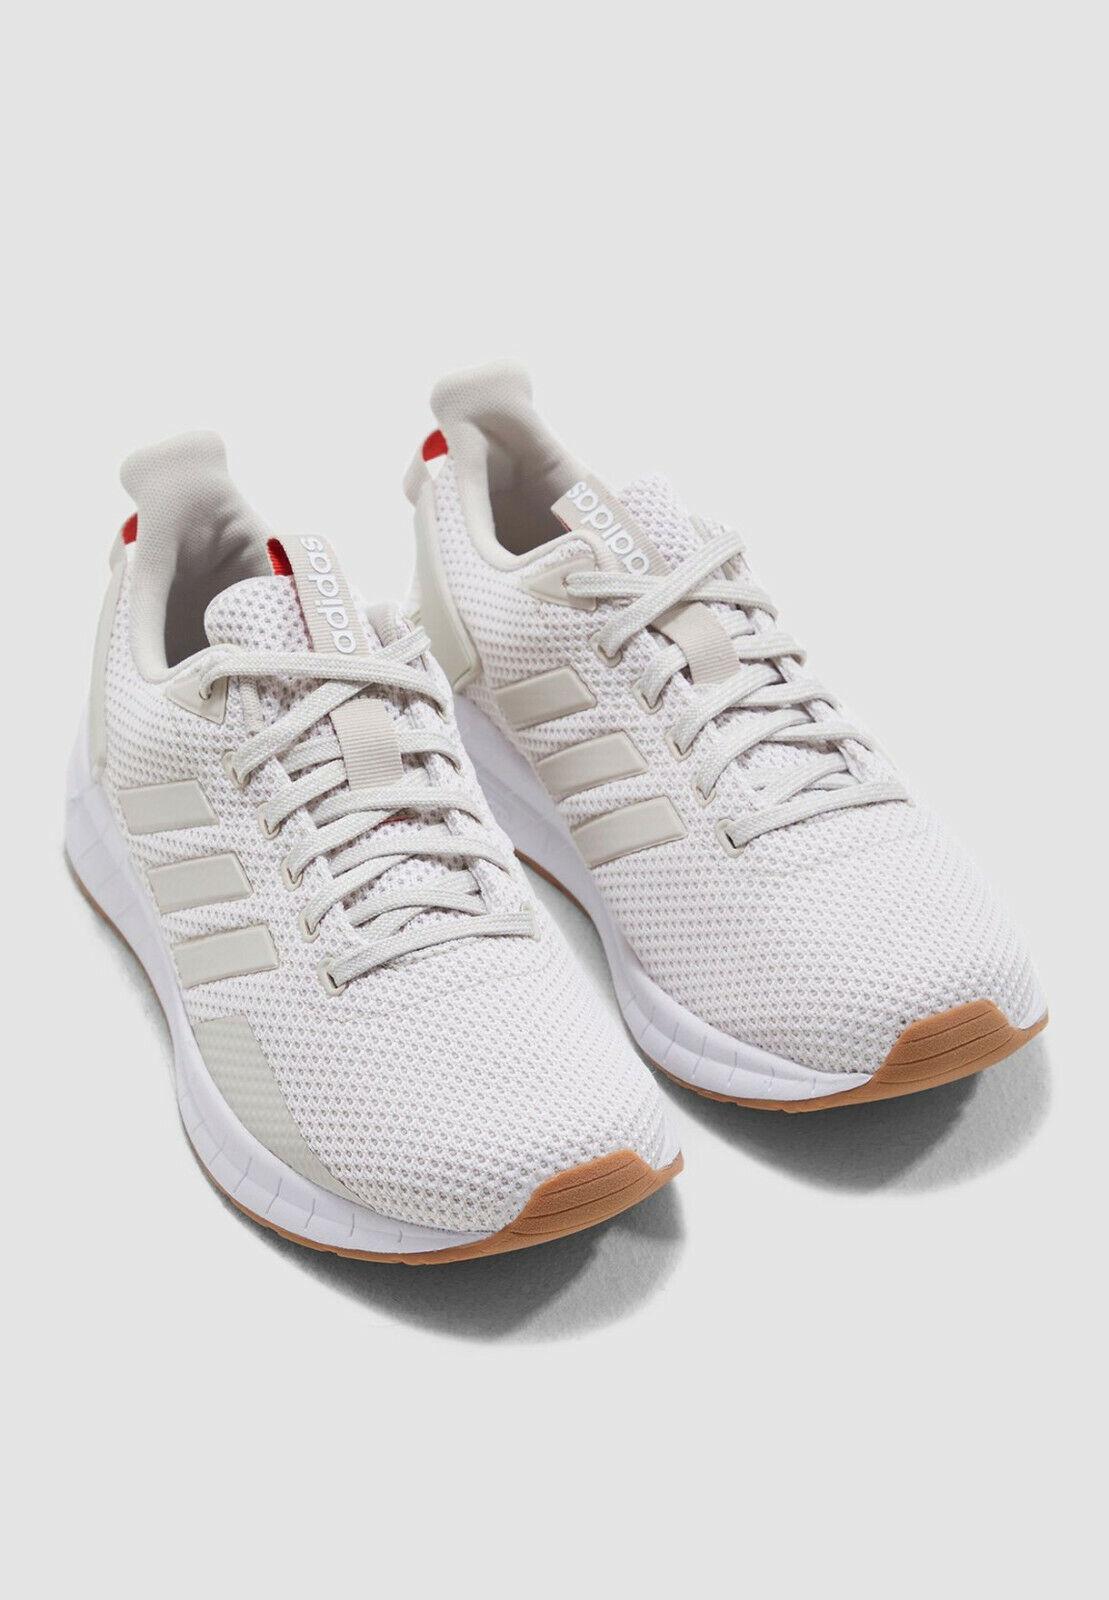 Adidas shoes women questar ride race cloudfoam f35036 sport  training  save 35% - 70% off